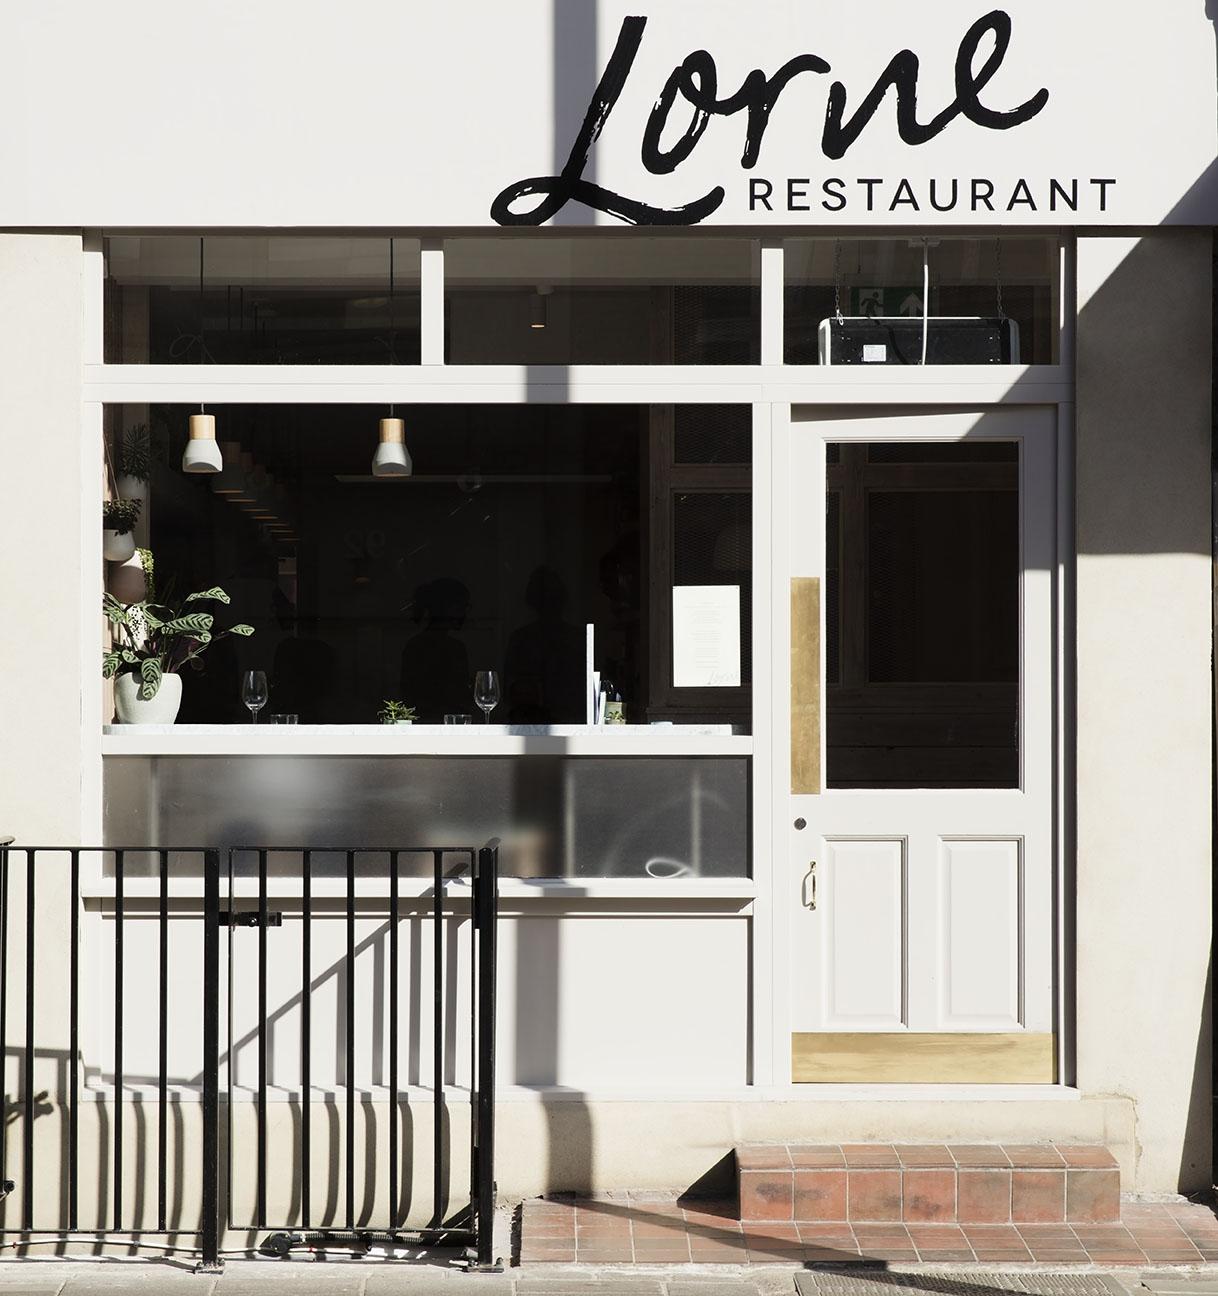 Lorne-01.jpg